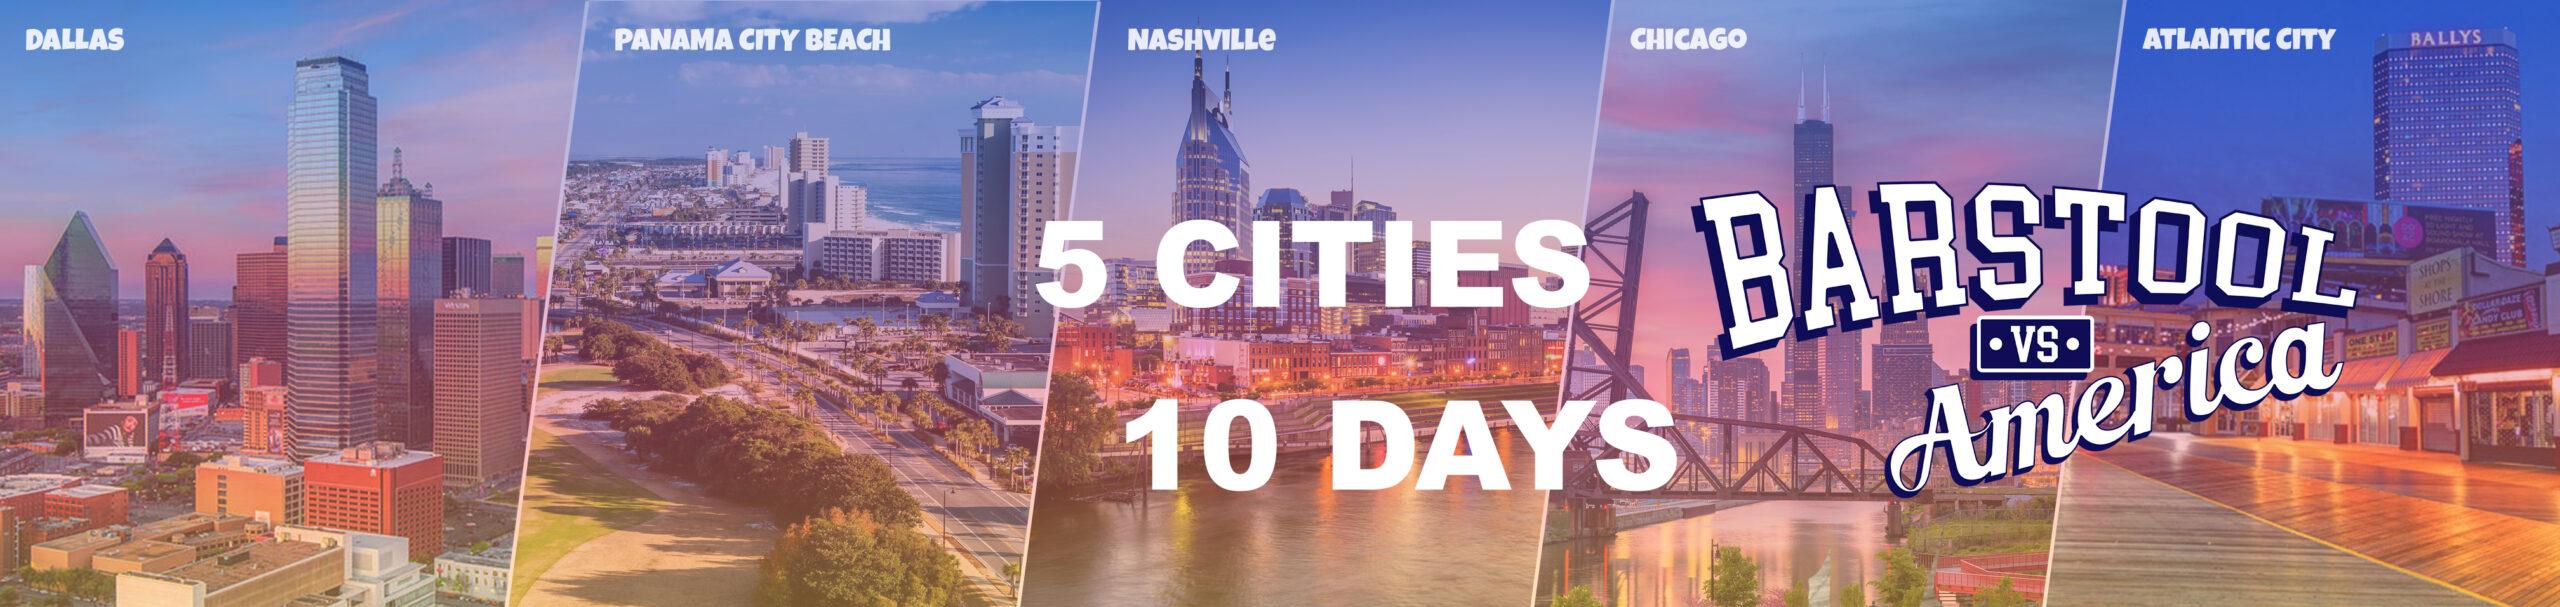 5 Cities, 10 Days to Produce Barstool Vs America